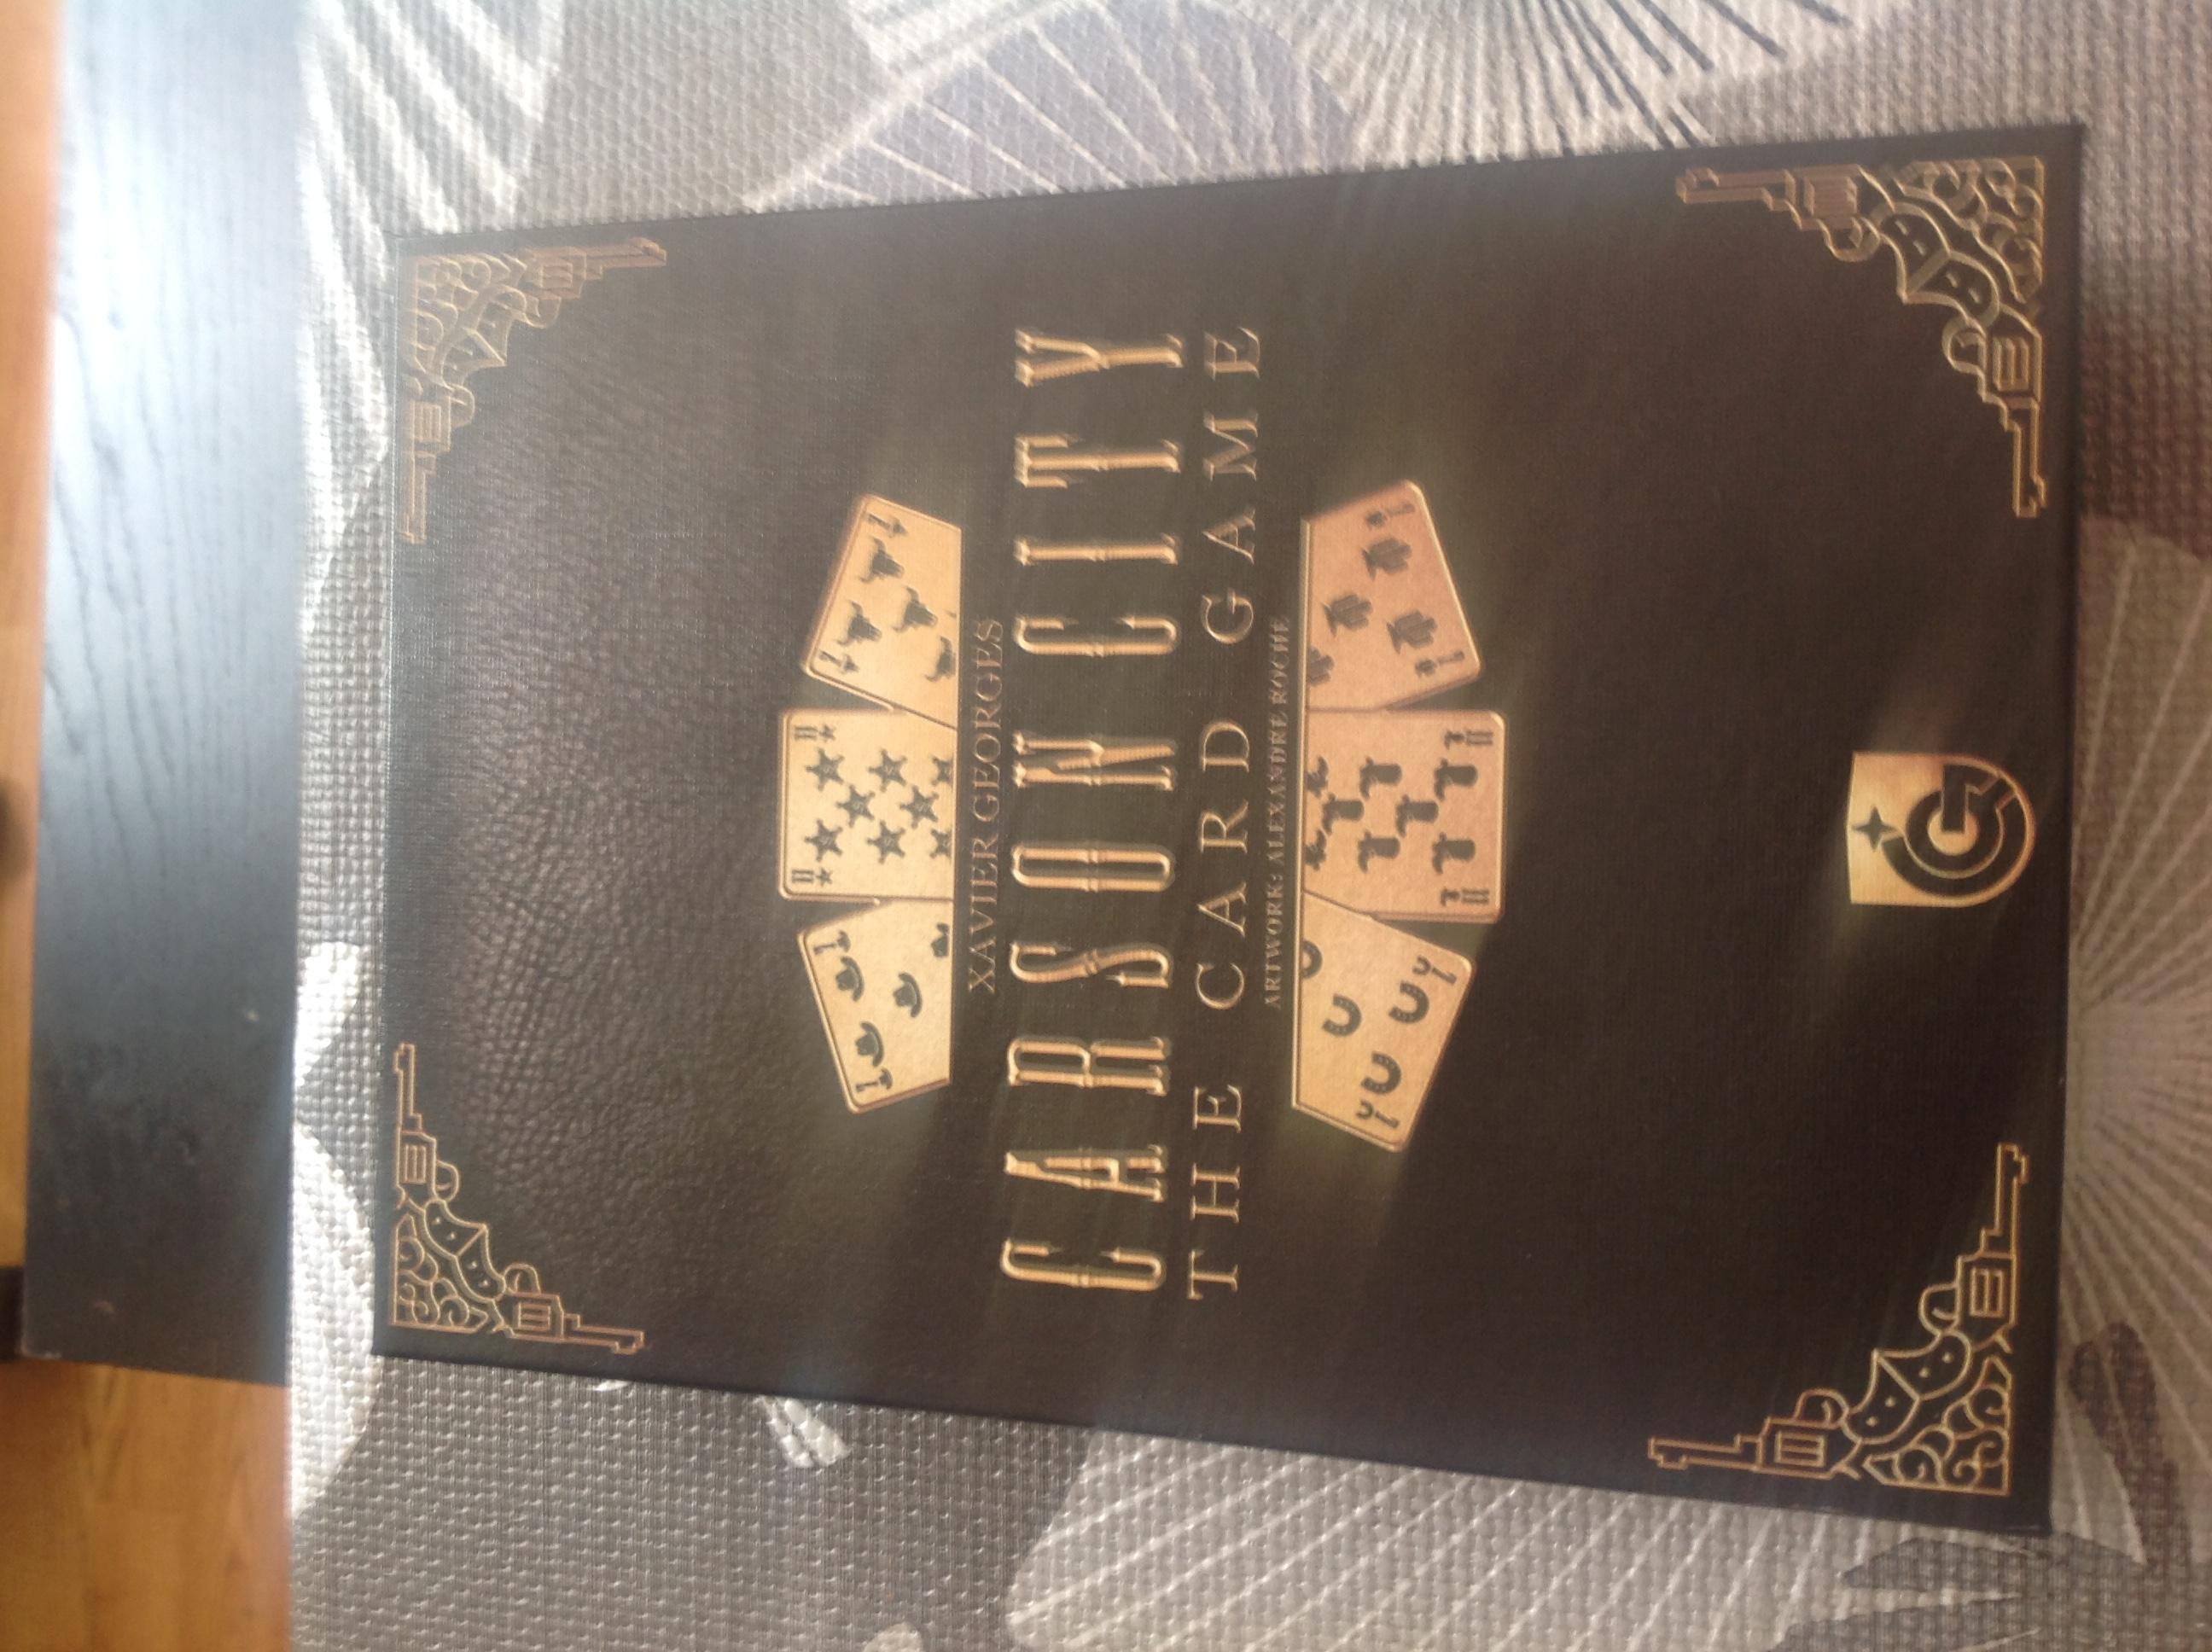 carson city the card games